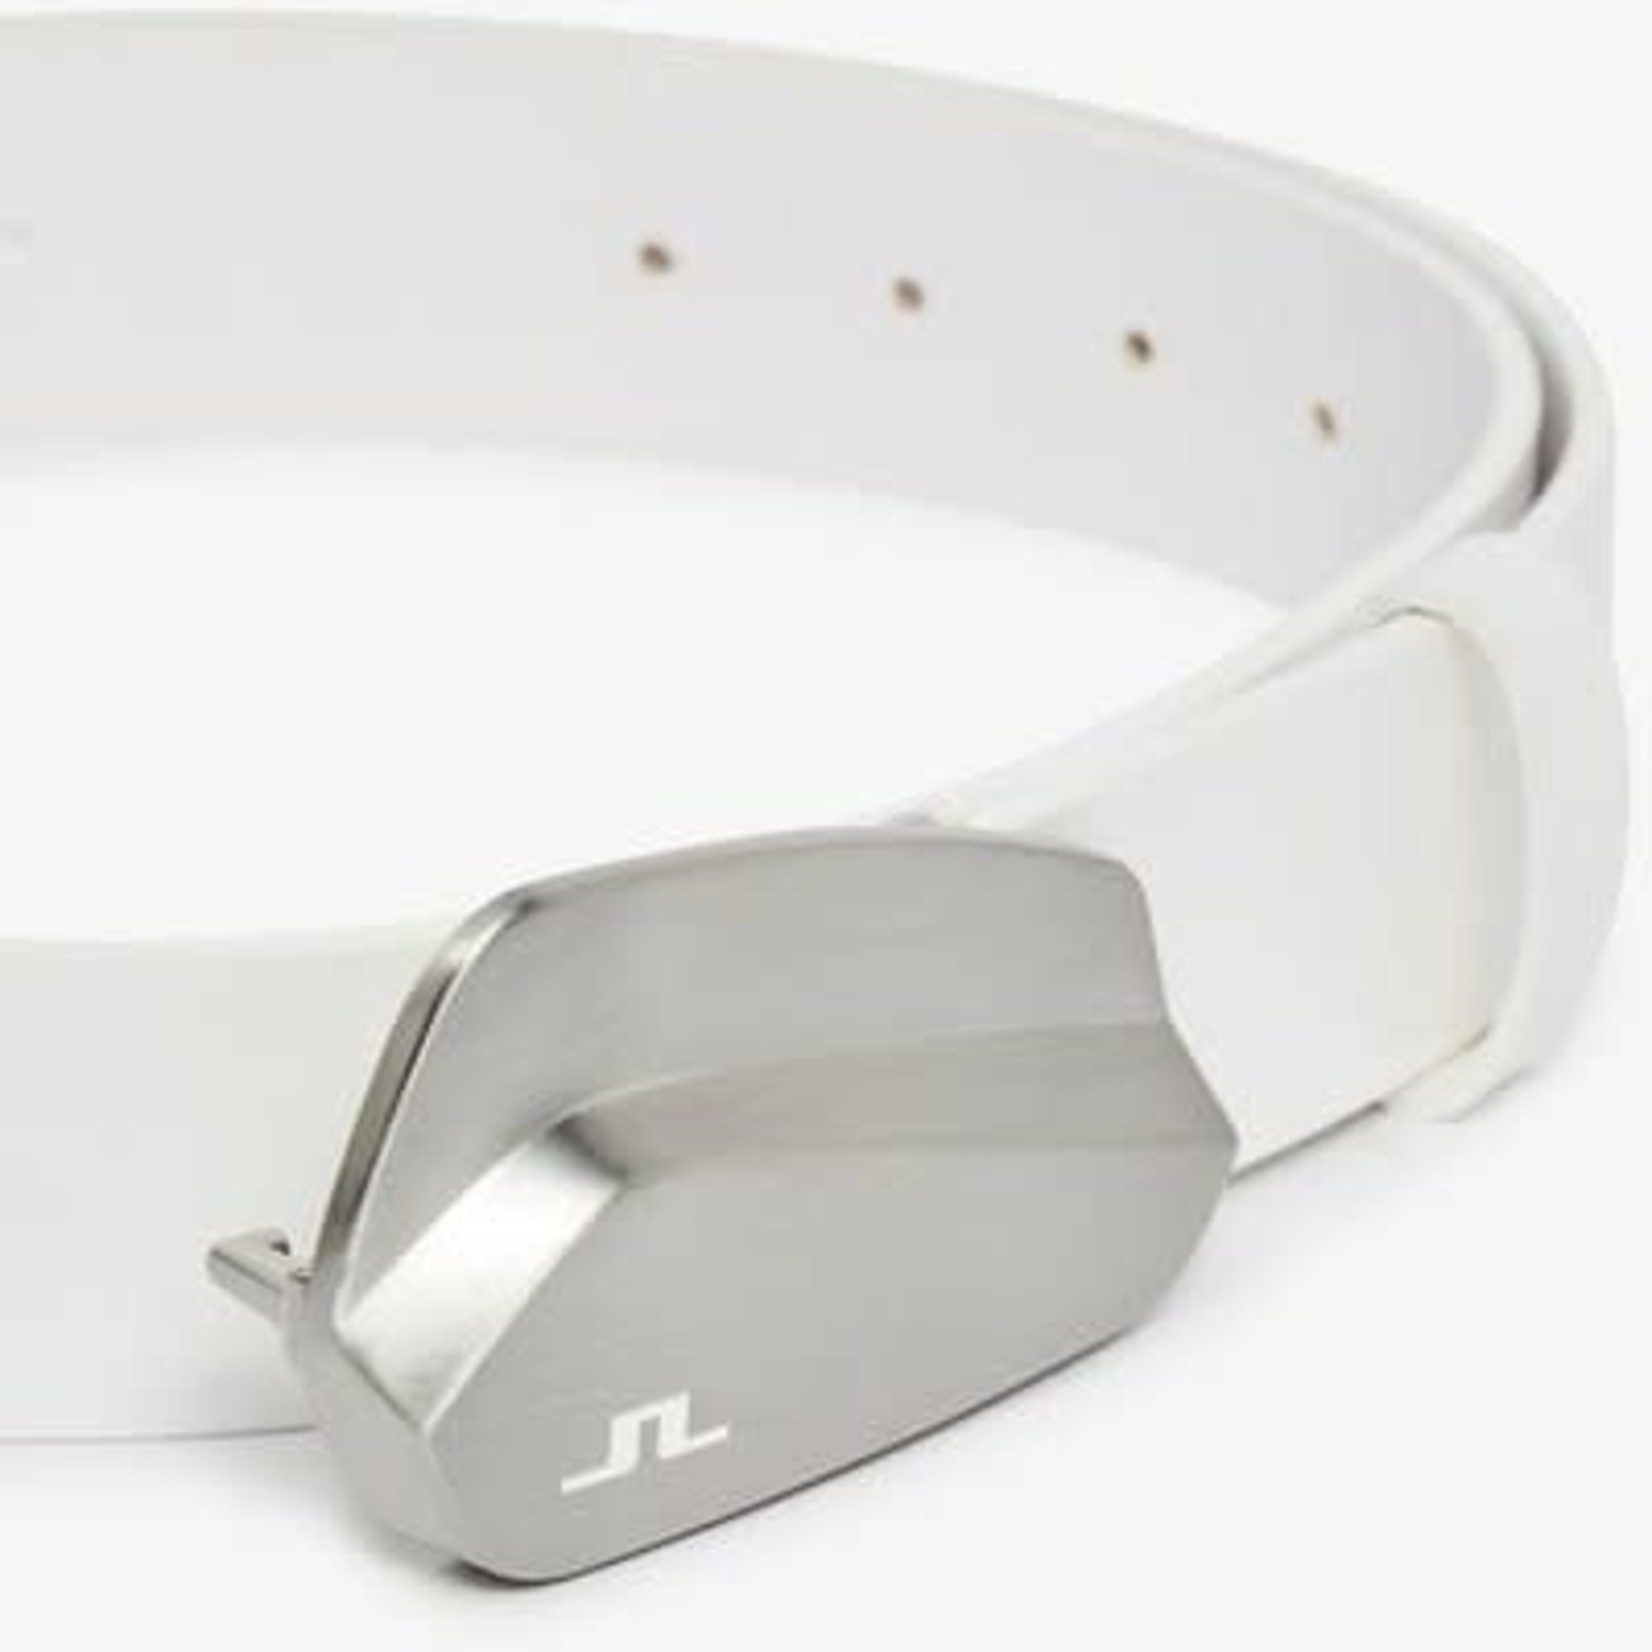 J.Lindeberg J.Lindeberg Golf Club Belt-White Leather White 110